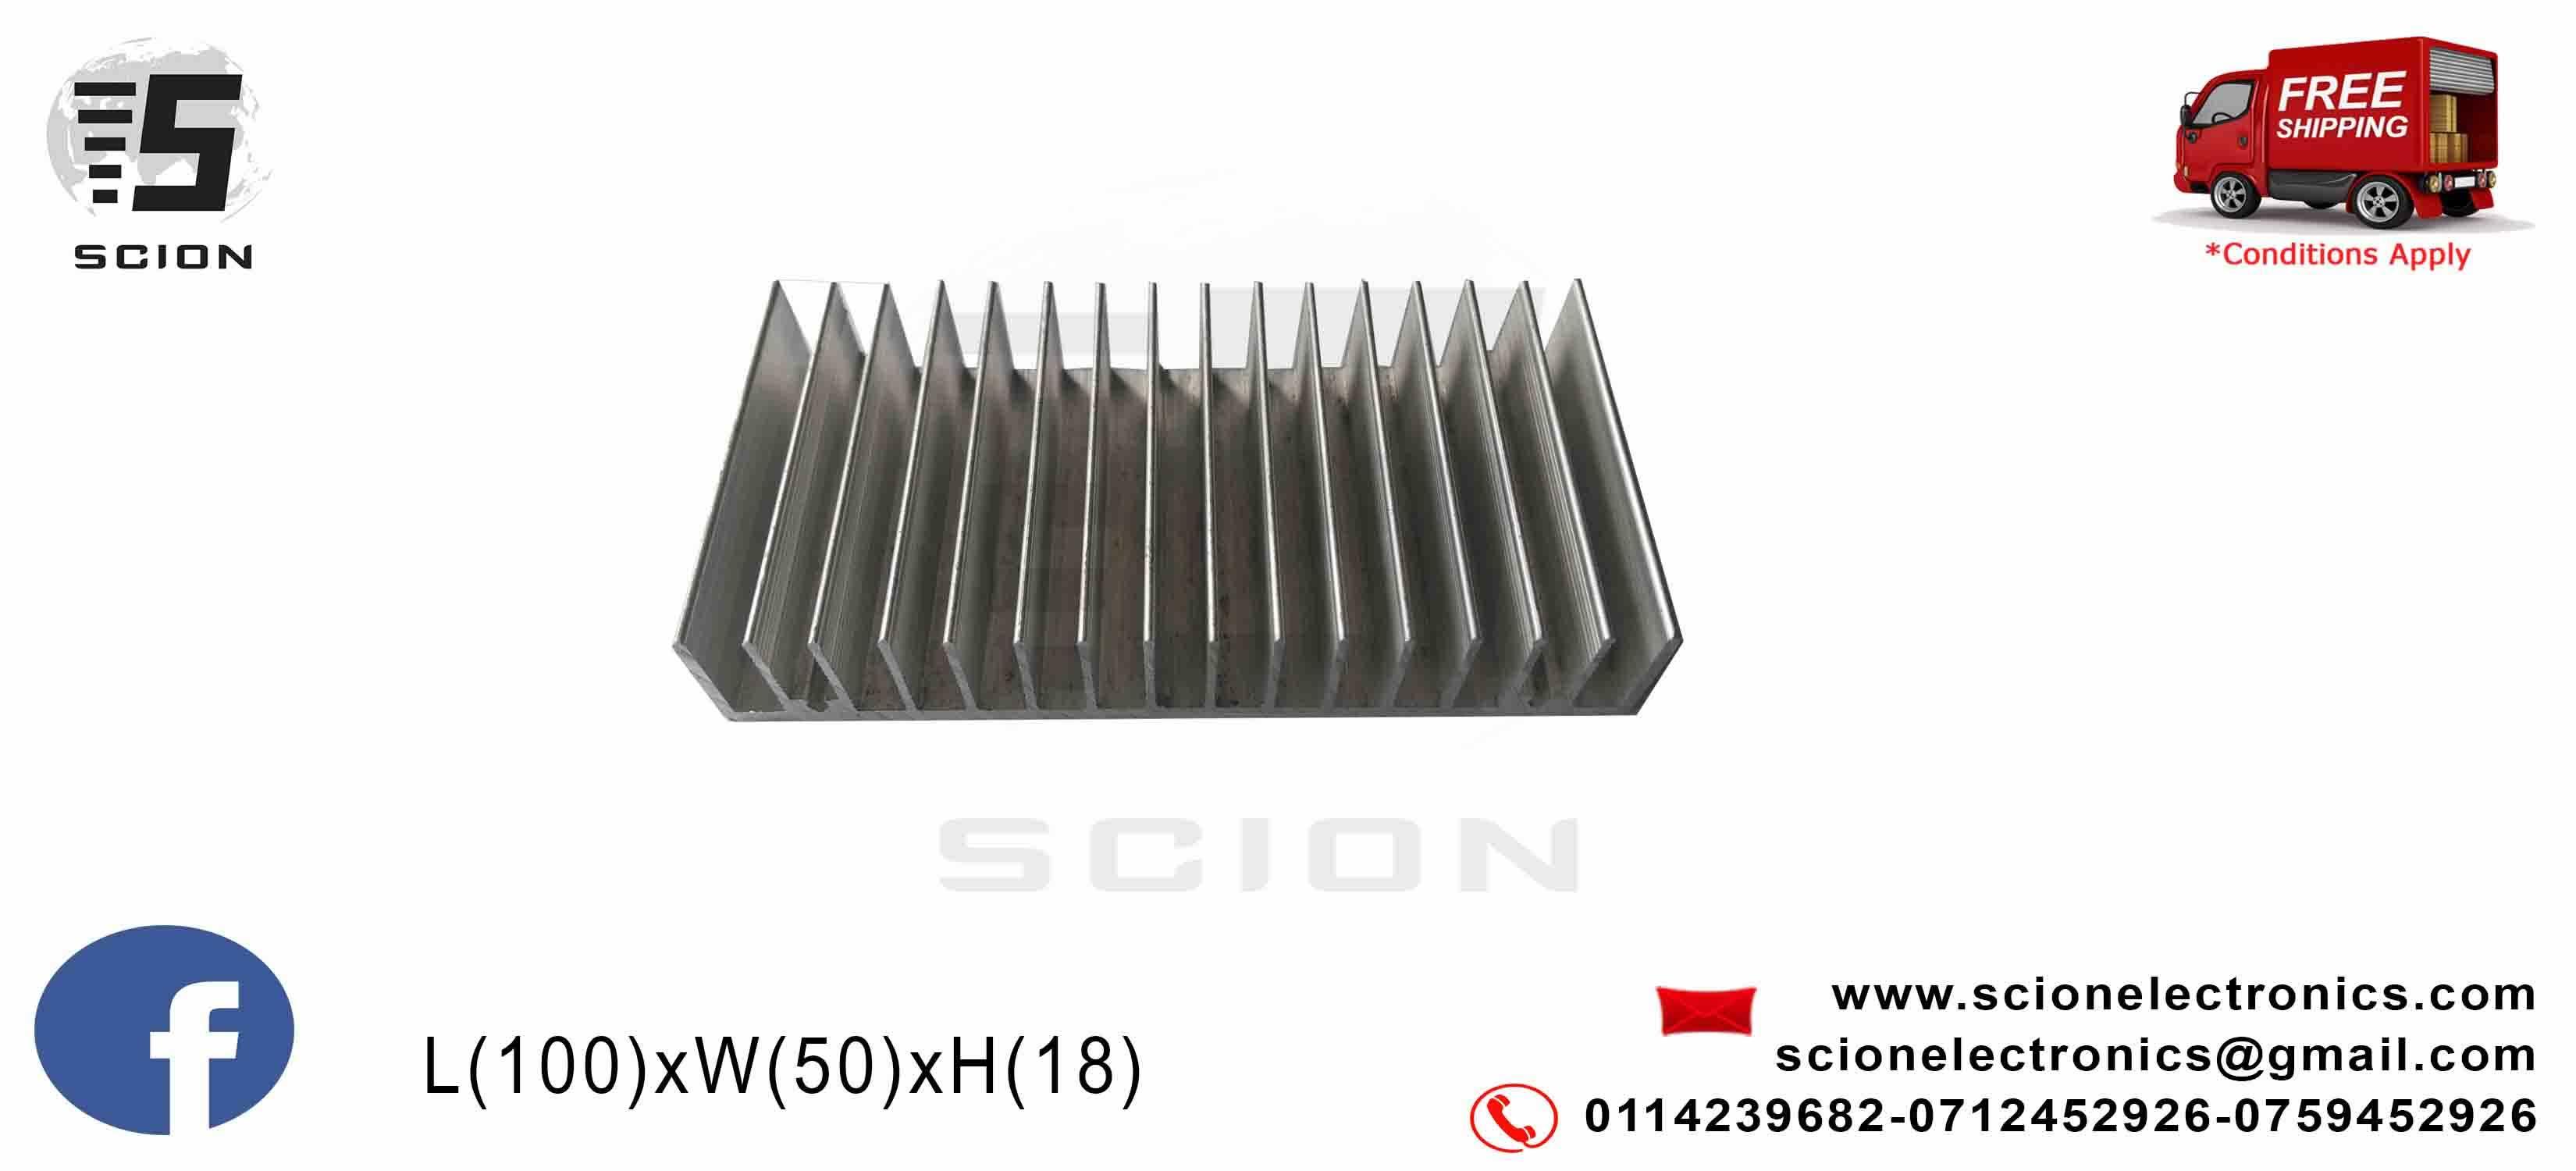 Heat Sink 100x50x18mm Local Scion Electronics